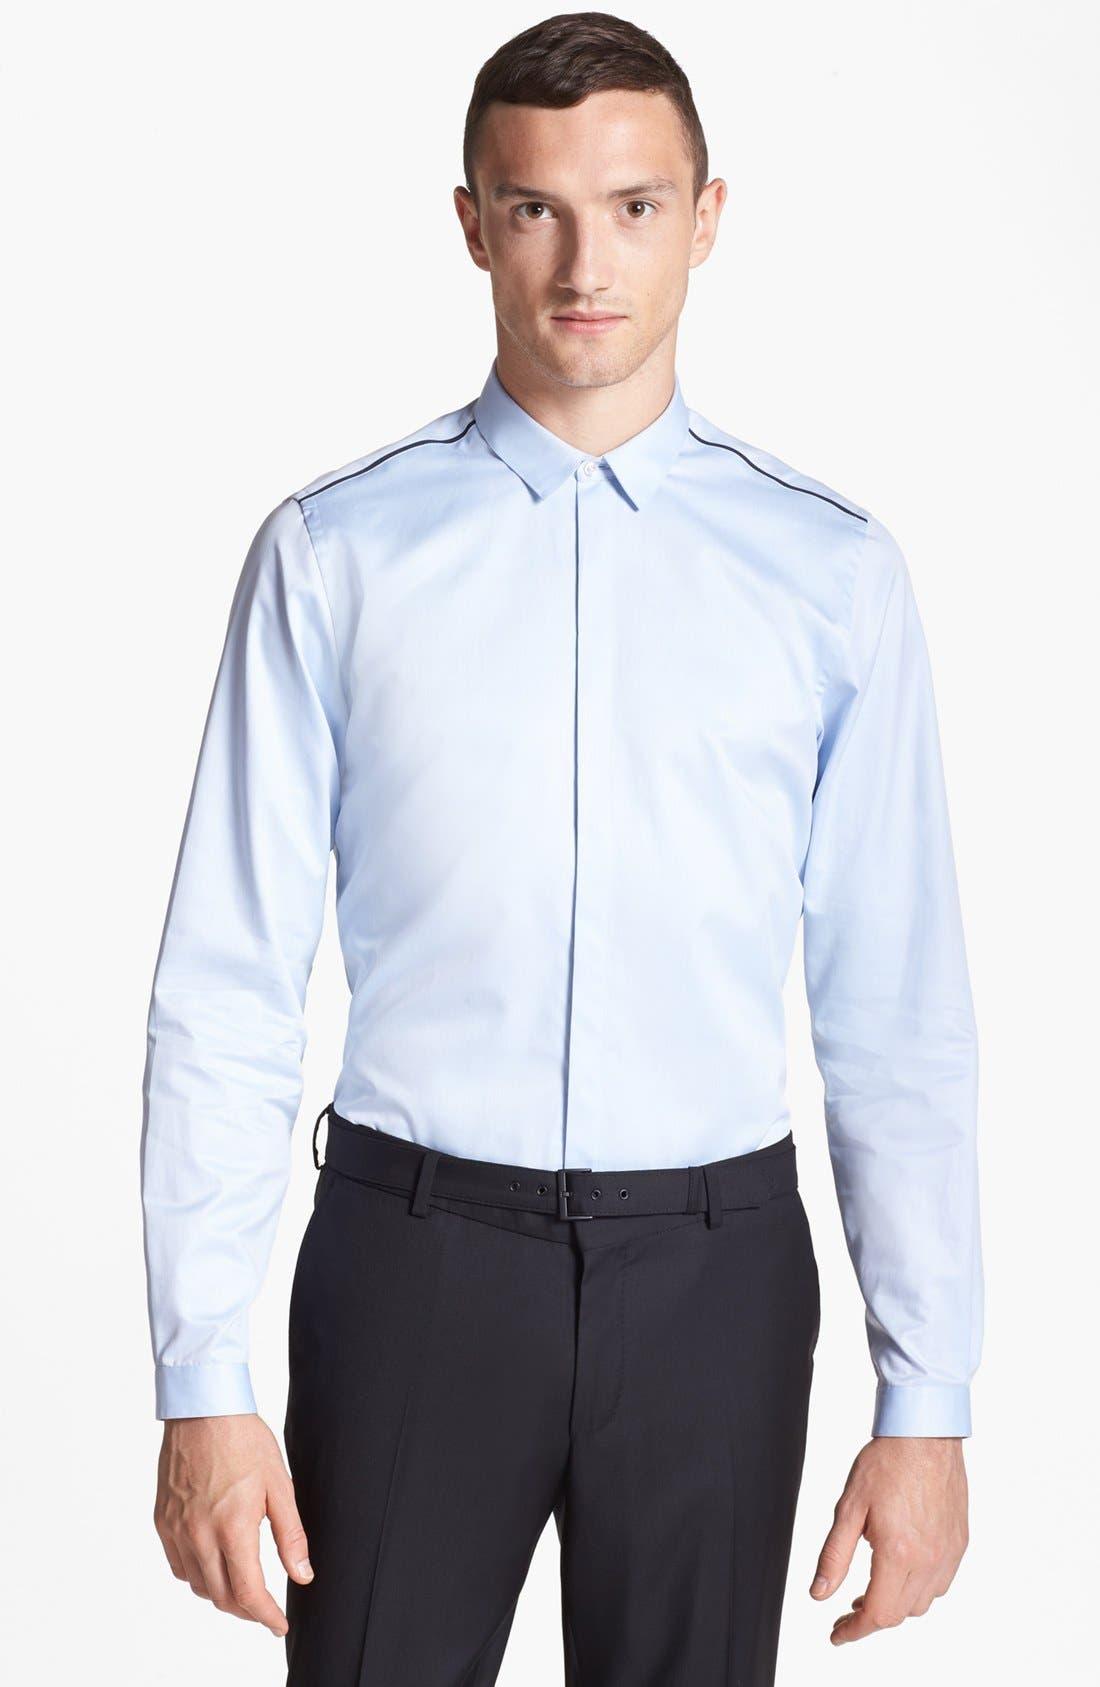 Main Image - The Kooples Contrast Trim Dress Shirt